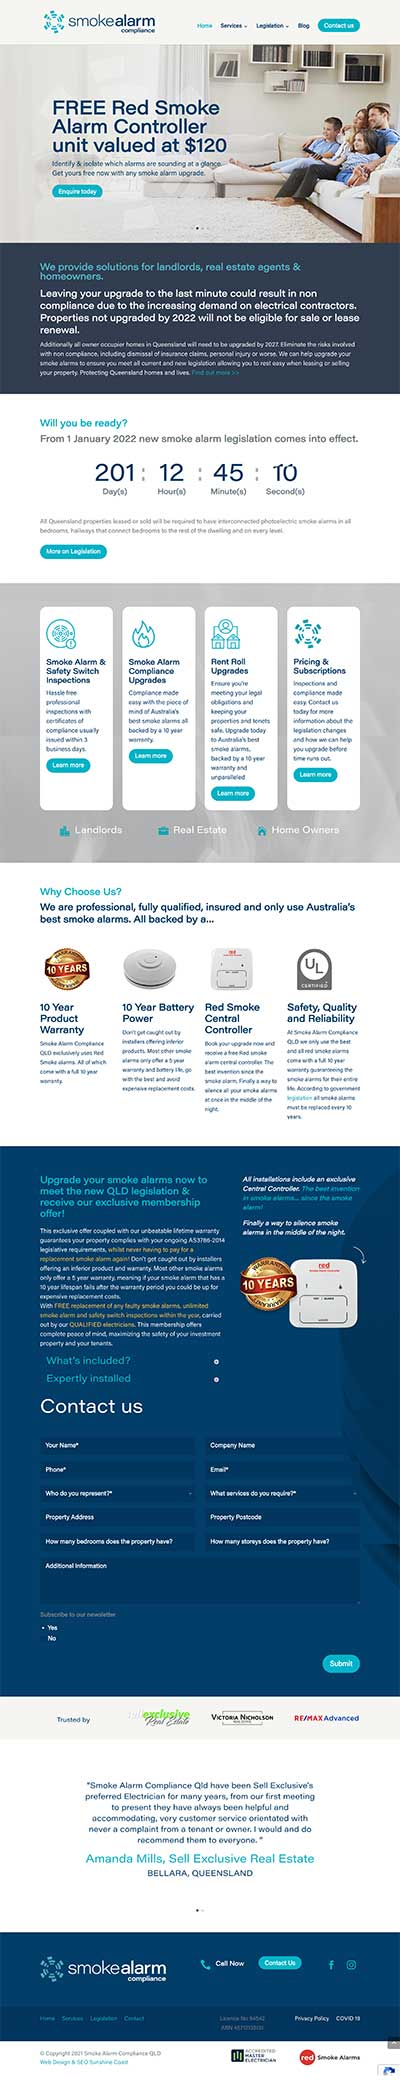 Smoke Alarm Website QLD Legislation Smoke Alarm Upgrade